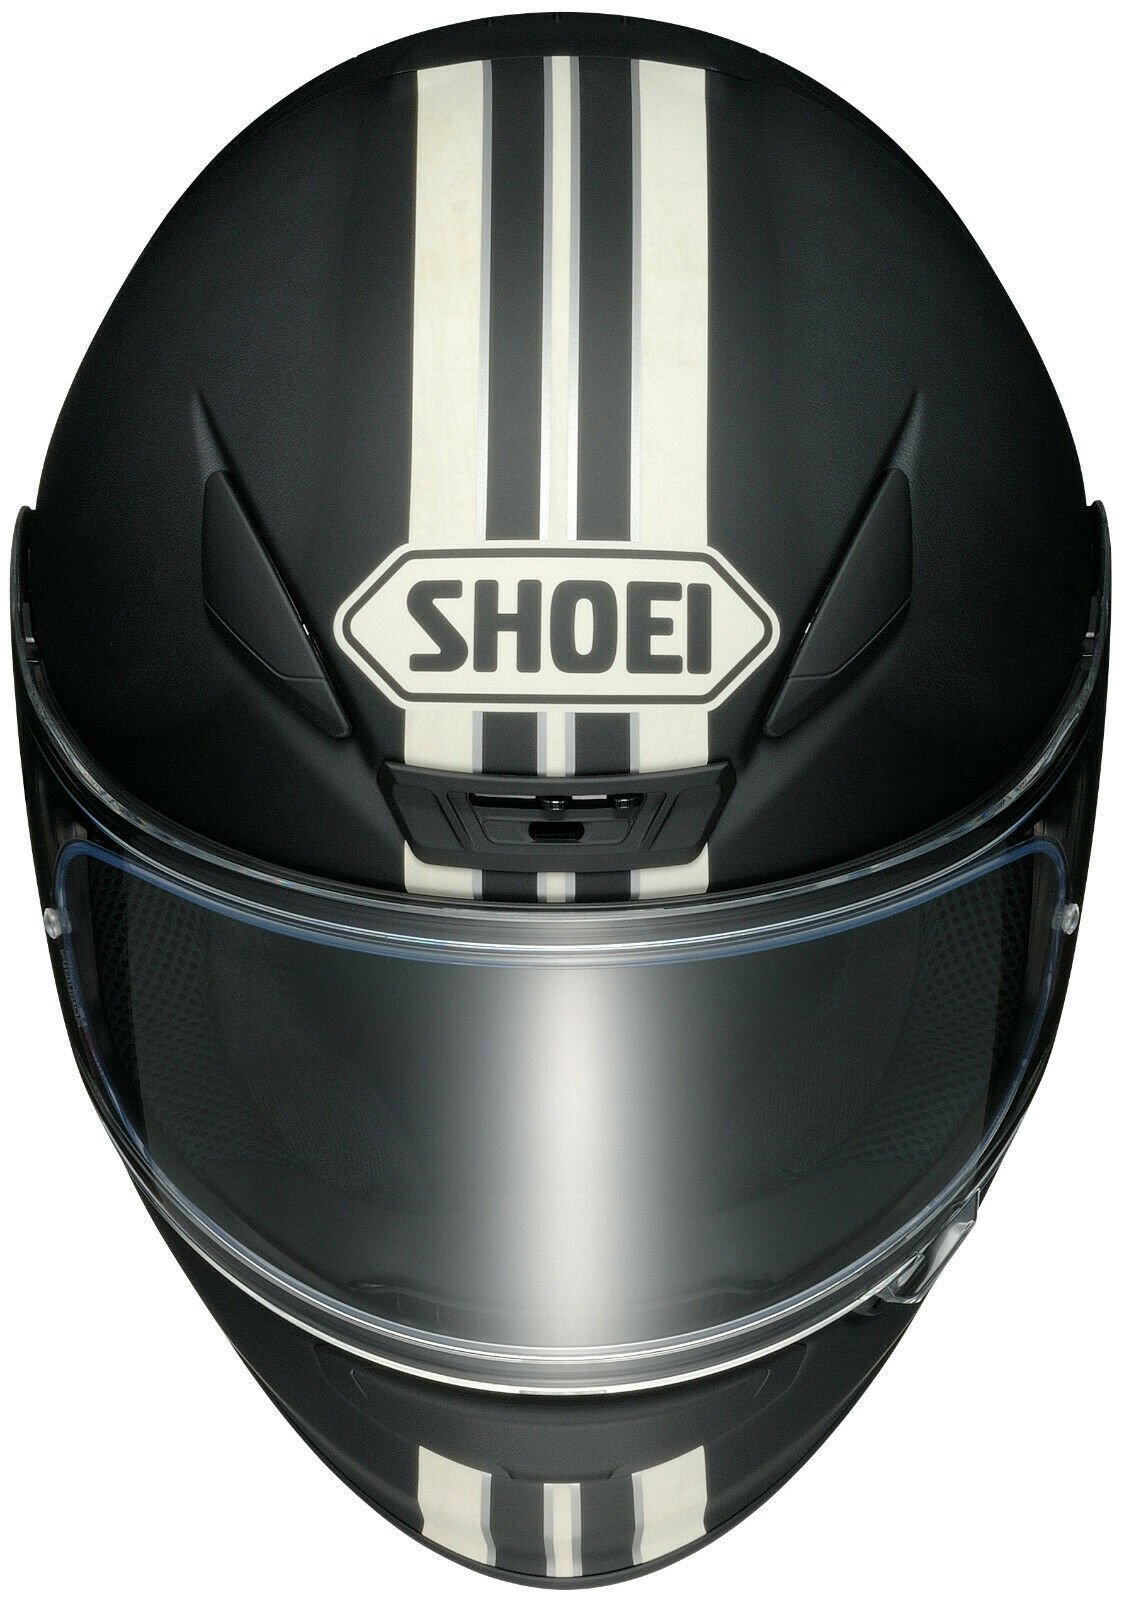 SHOEI-RF-1200-EQUATE-Helmet-ALL-SIZES-DOT-SNELL-Street-Full-Face-Patriotic miniature 7